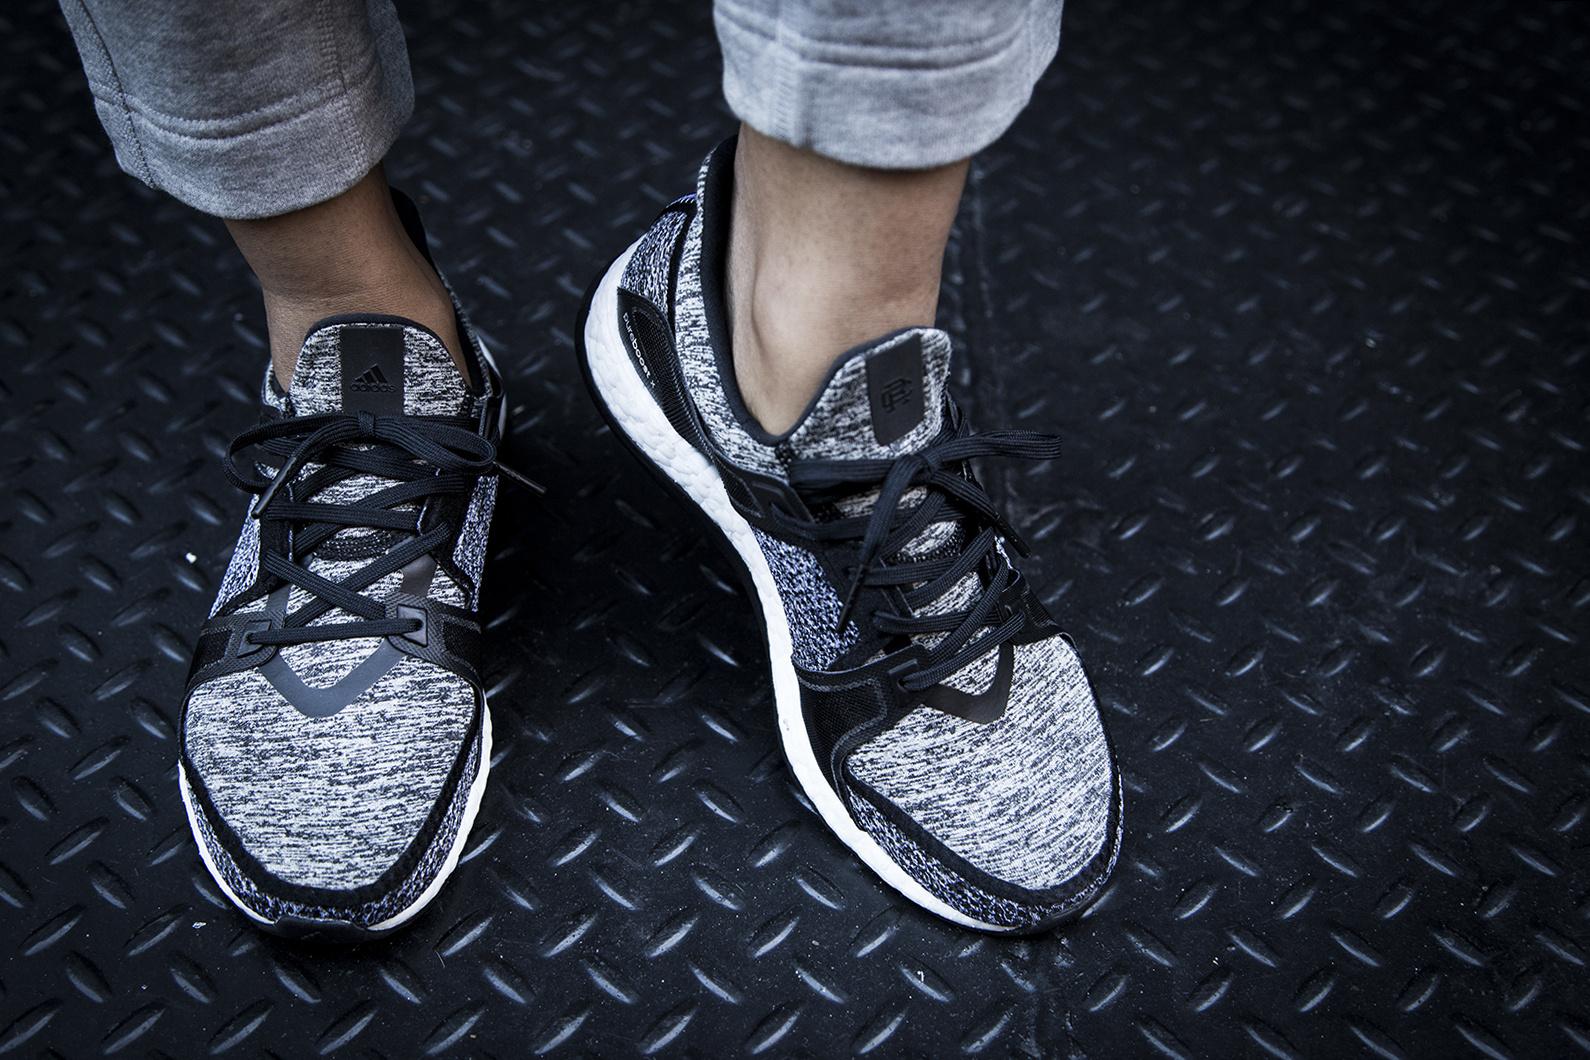 reigning-champ-adidas-pureboost-closer-look-04.jpg